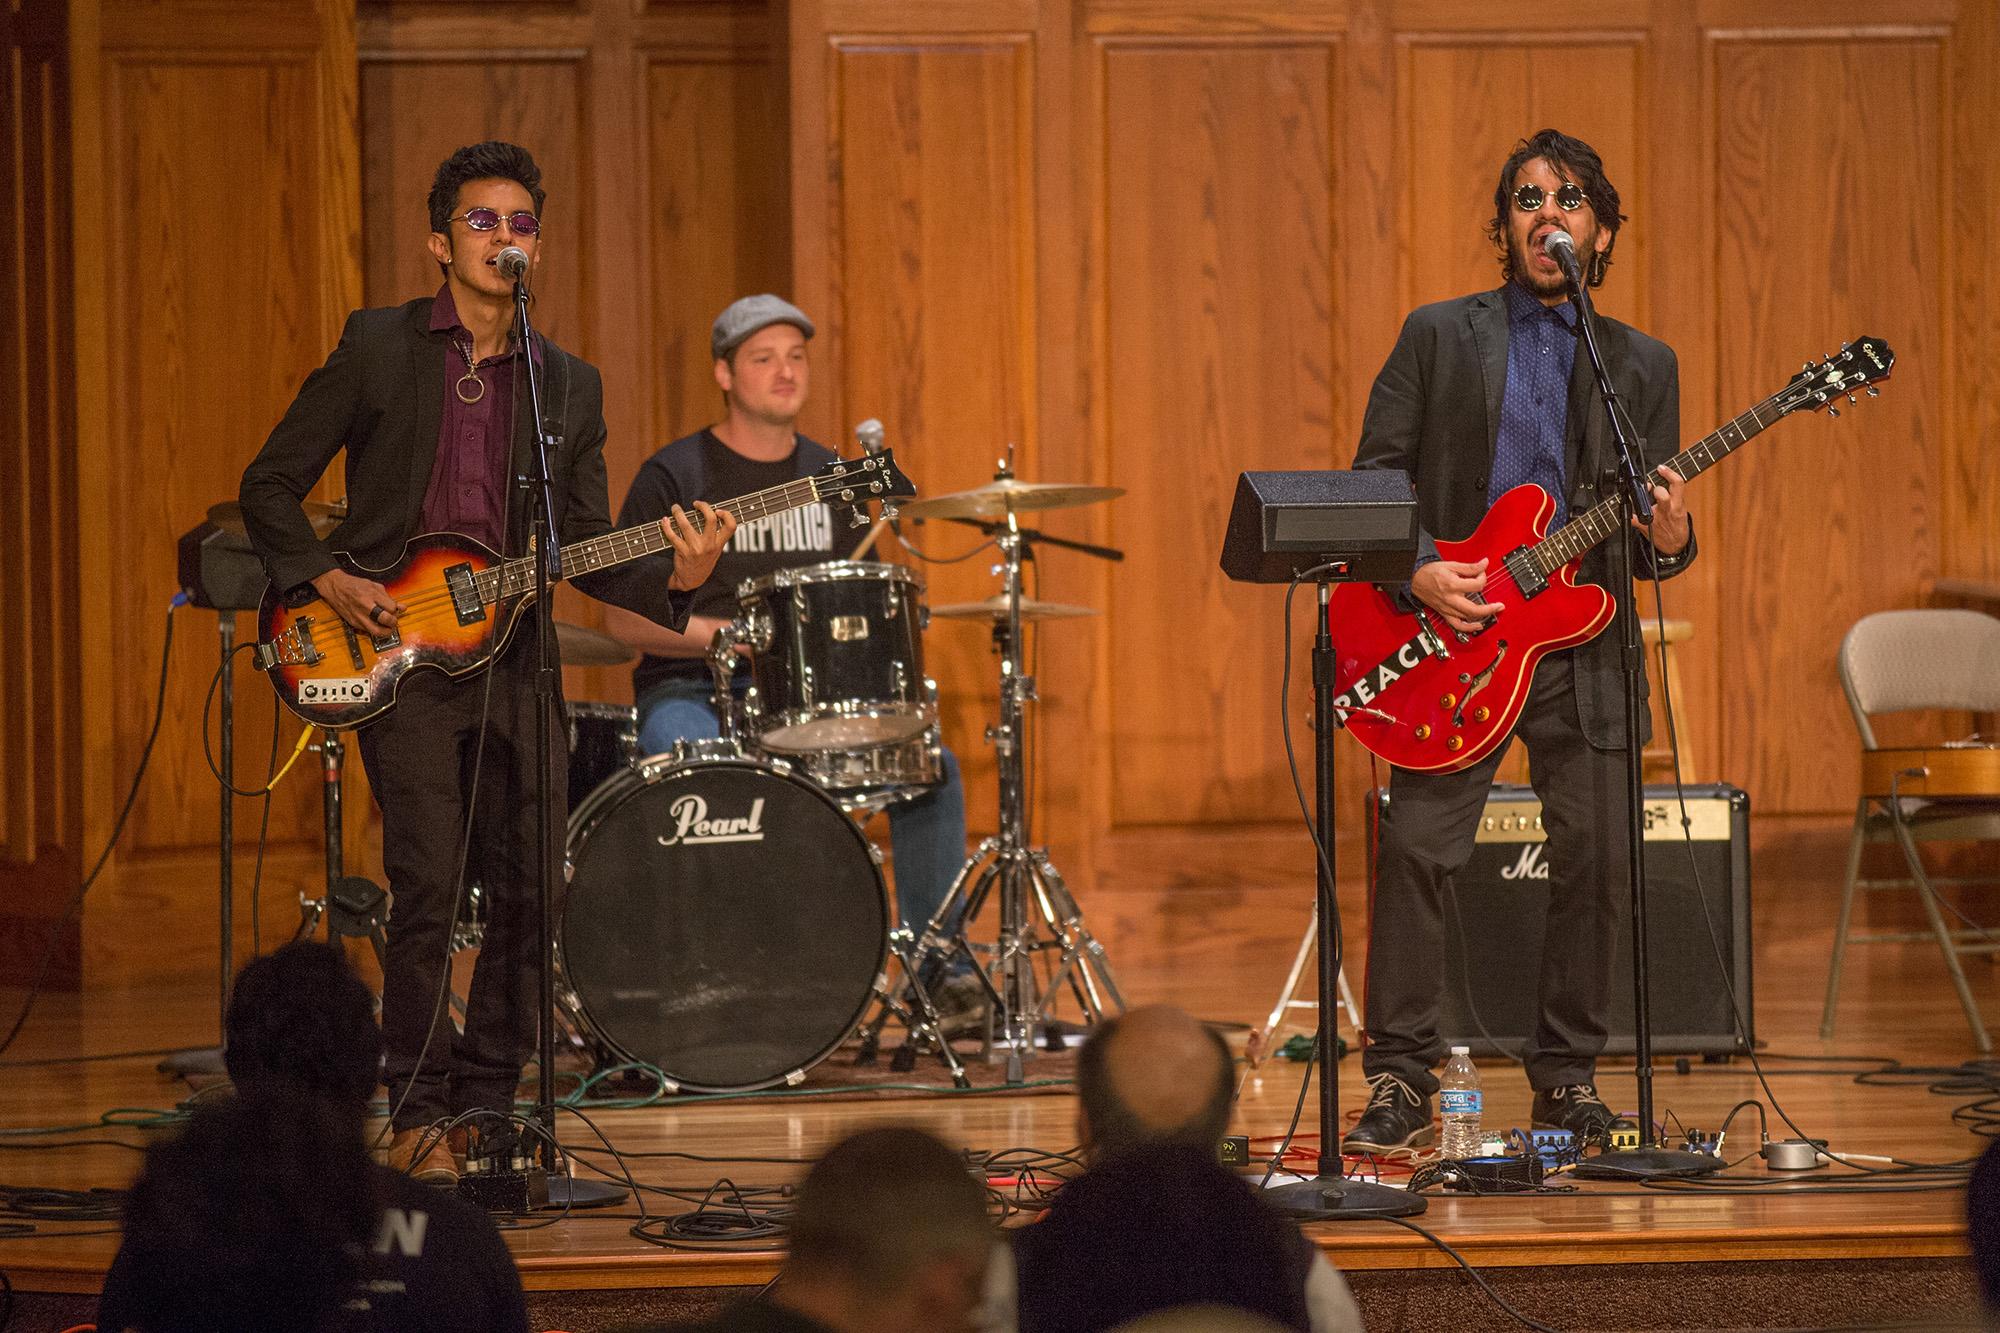 La Repvblica - Juan Moya, Nathaniel Yoder and Daniel Moya '08 - performs at the International Music Concert Saturday evening.